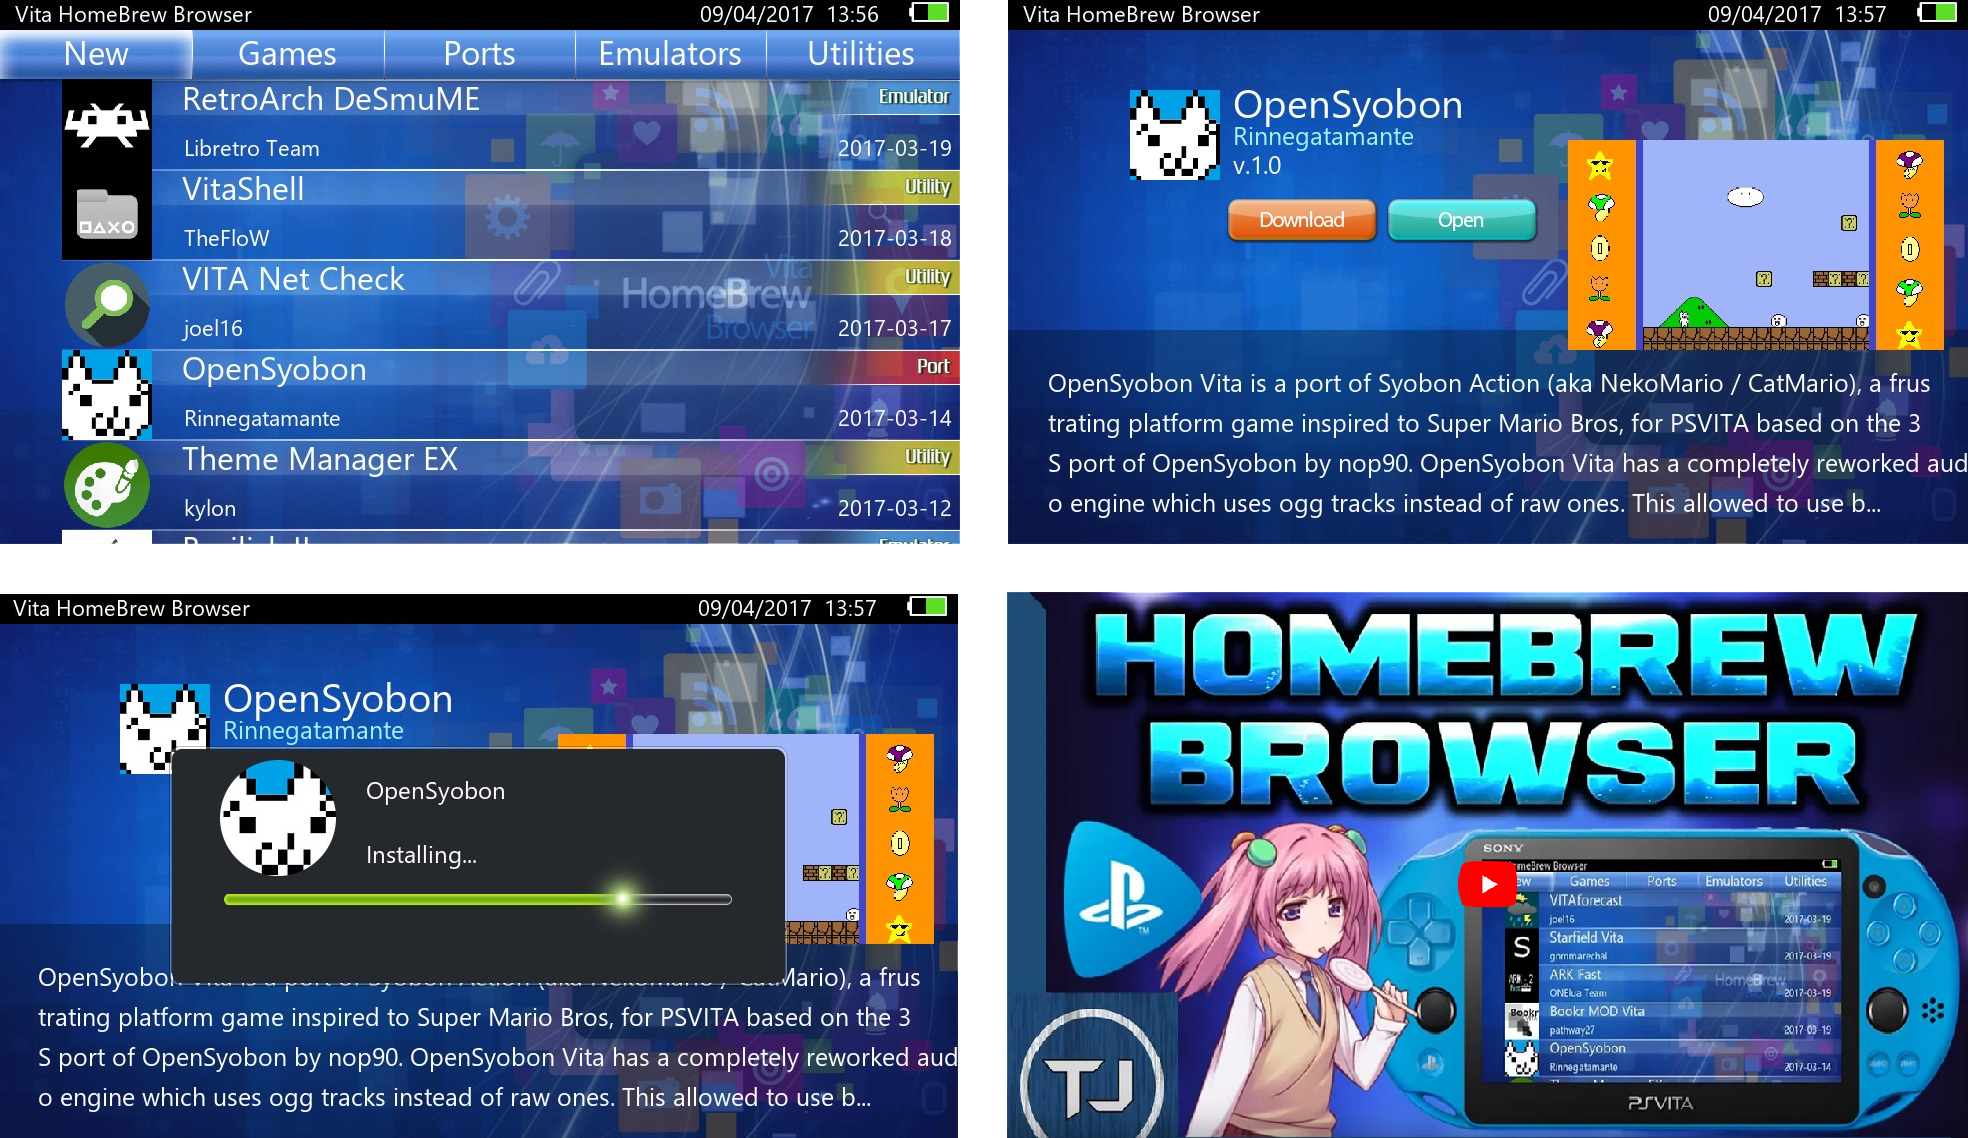 VHBB screenshots